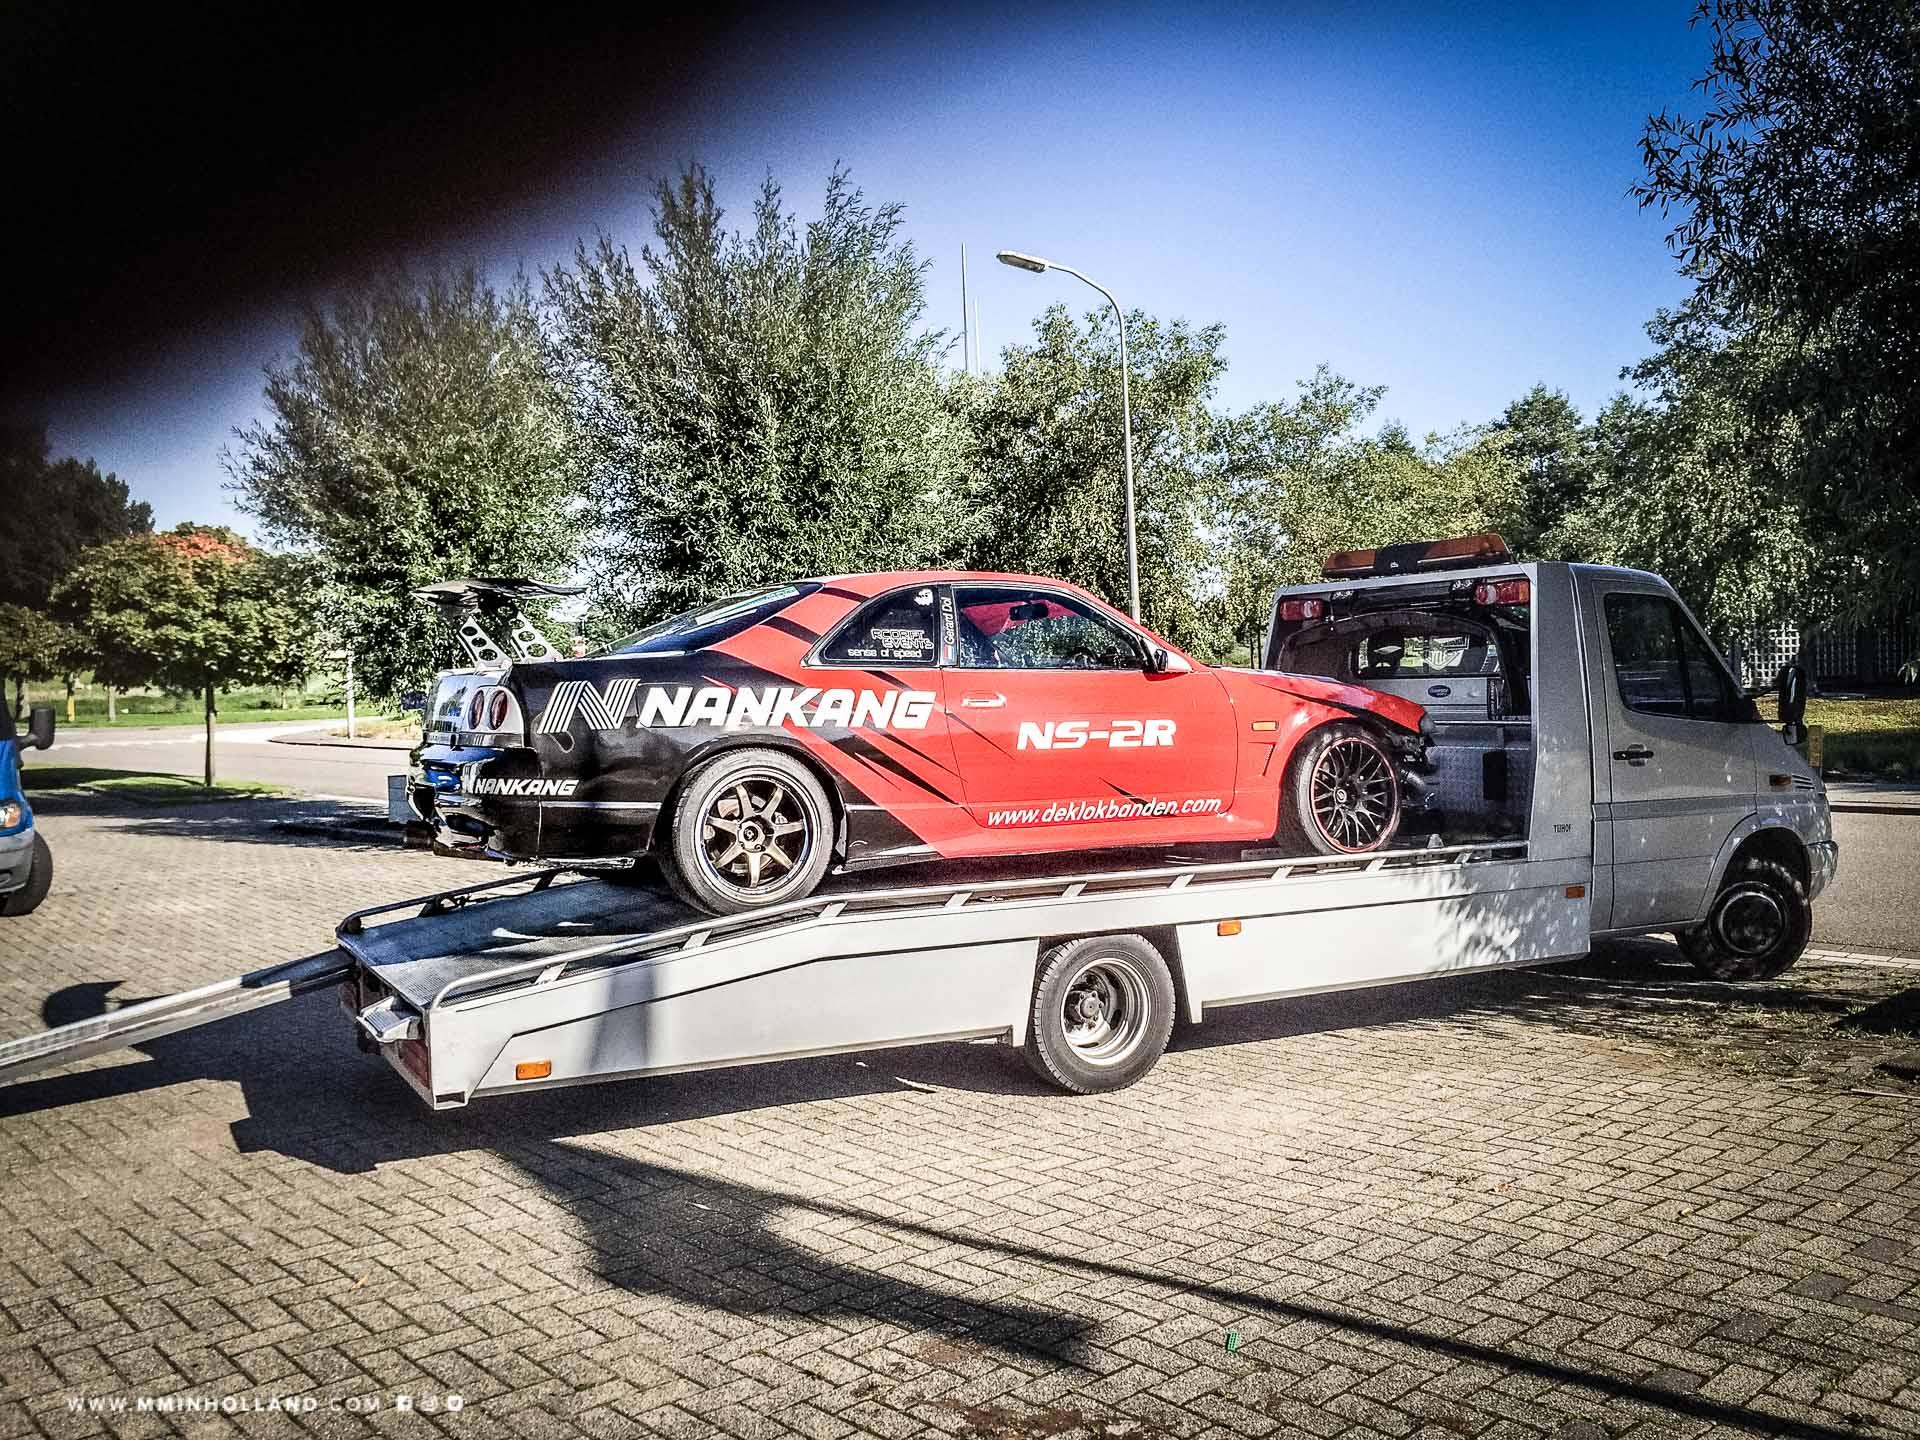 Carwrap van MindMade in holland - Nissan Skyline driftcar van Gerard Dol